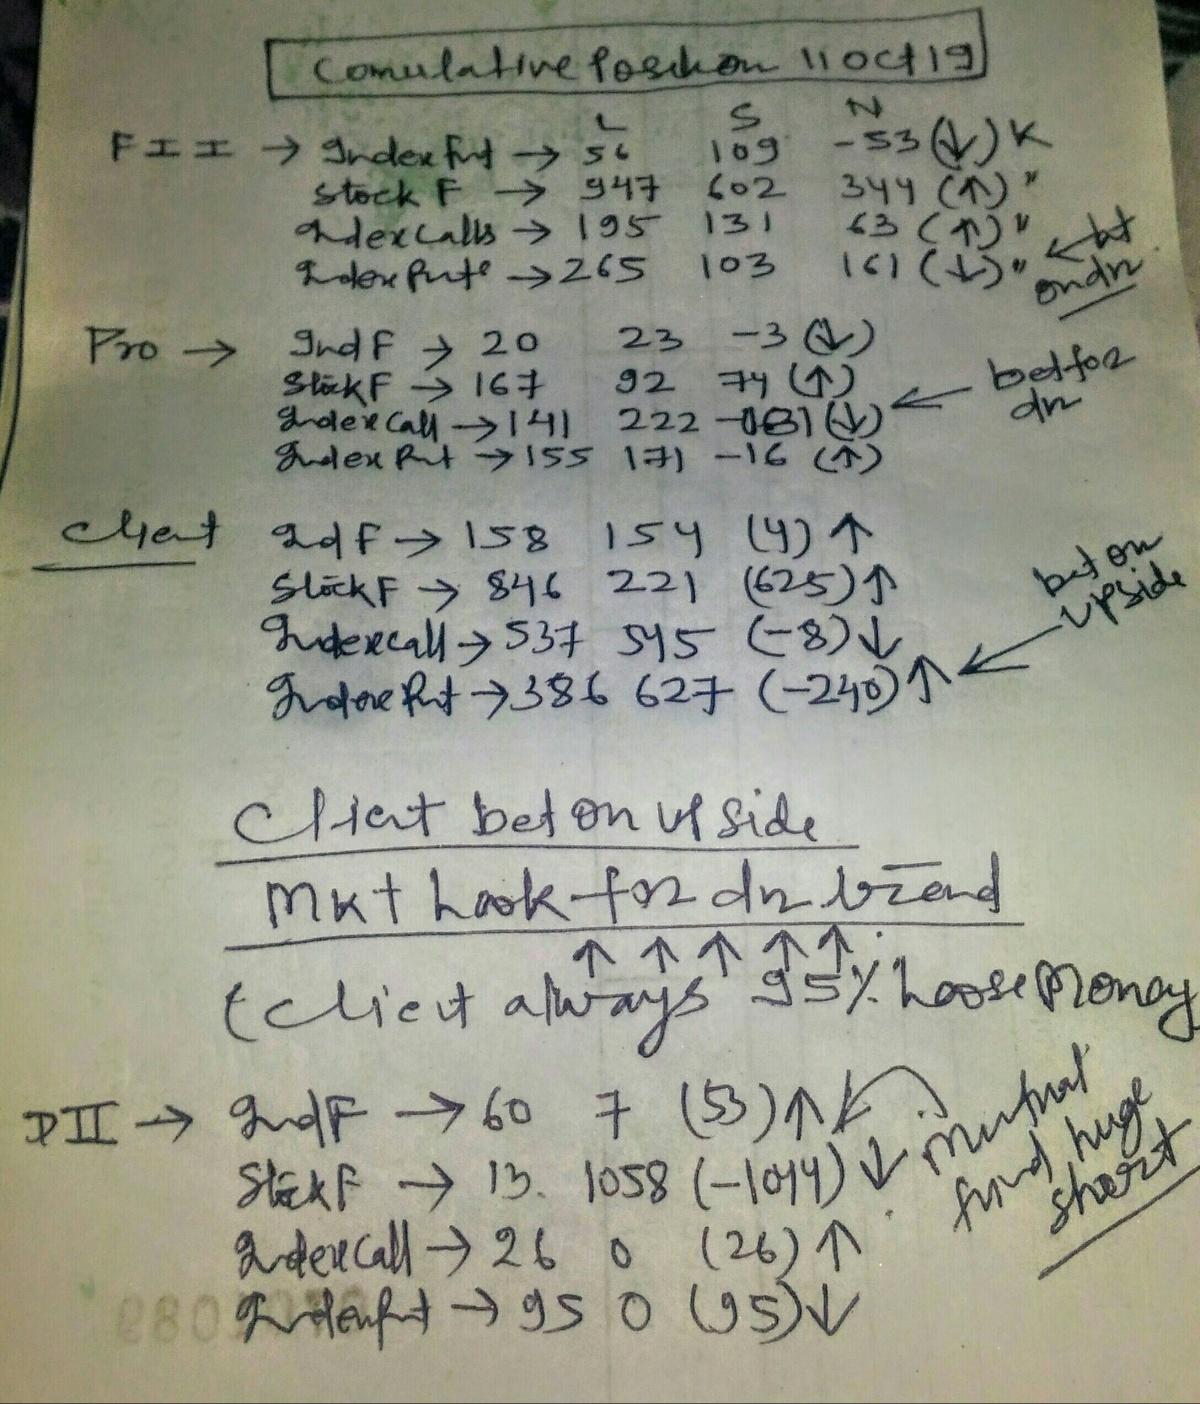 IDX:NIFTY 50 - chart - 396433